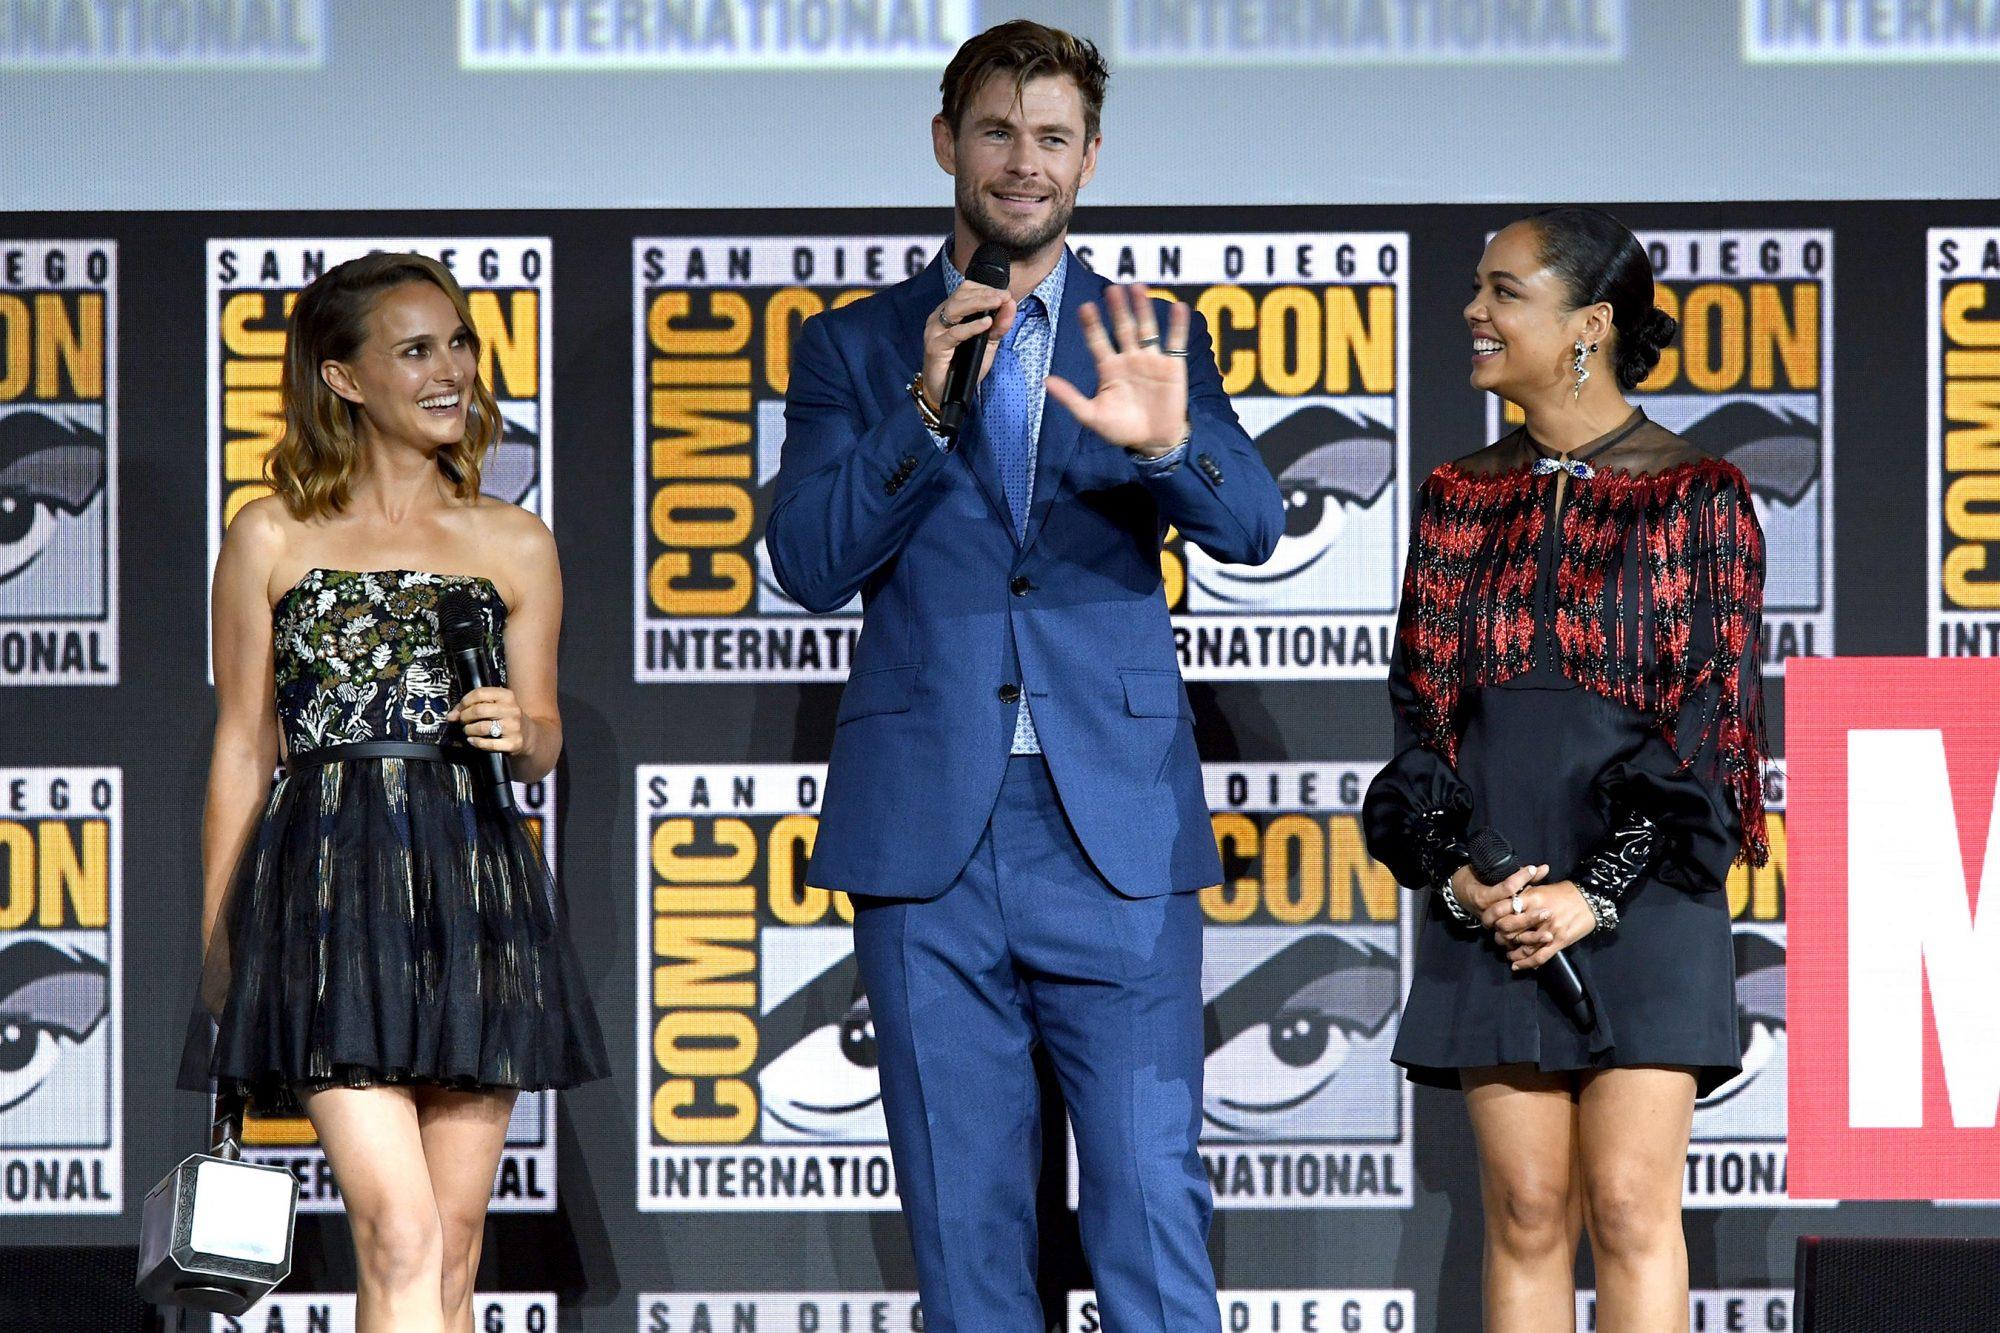 Natalie Portman, Chris Hemsworth and Tessa Thompson